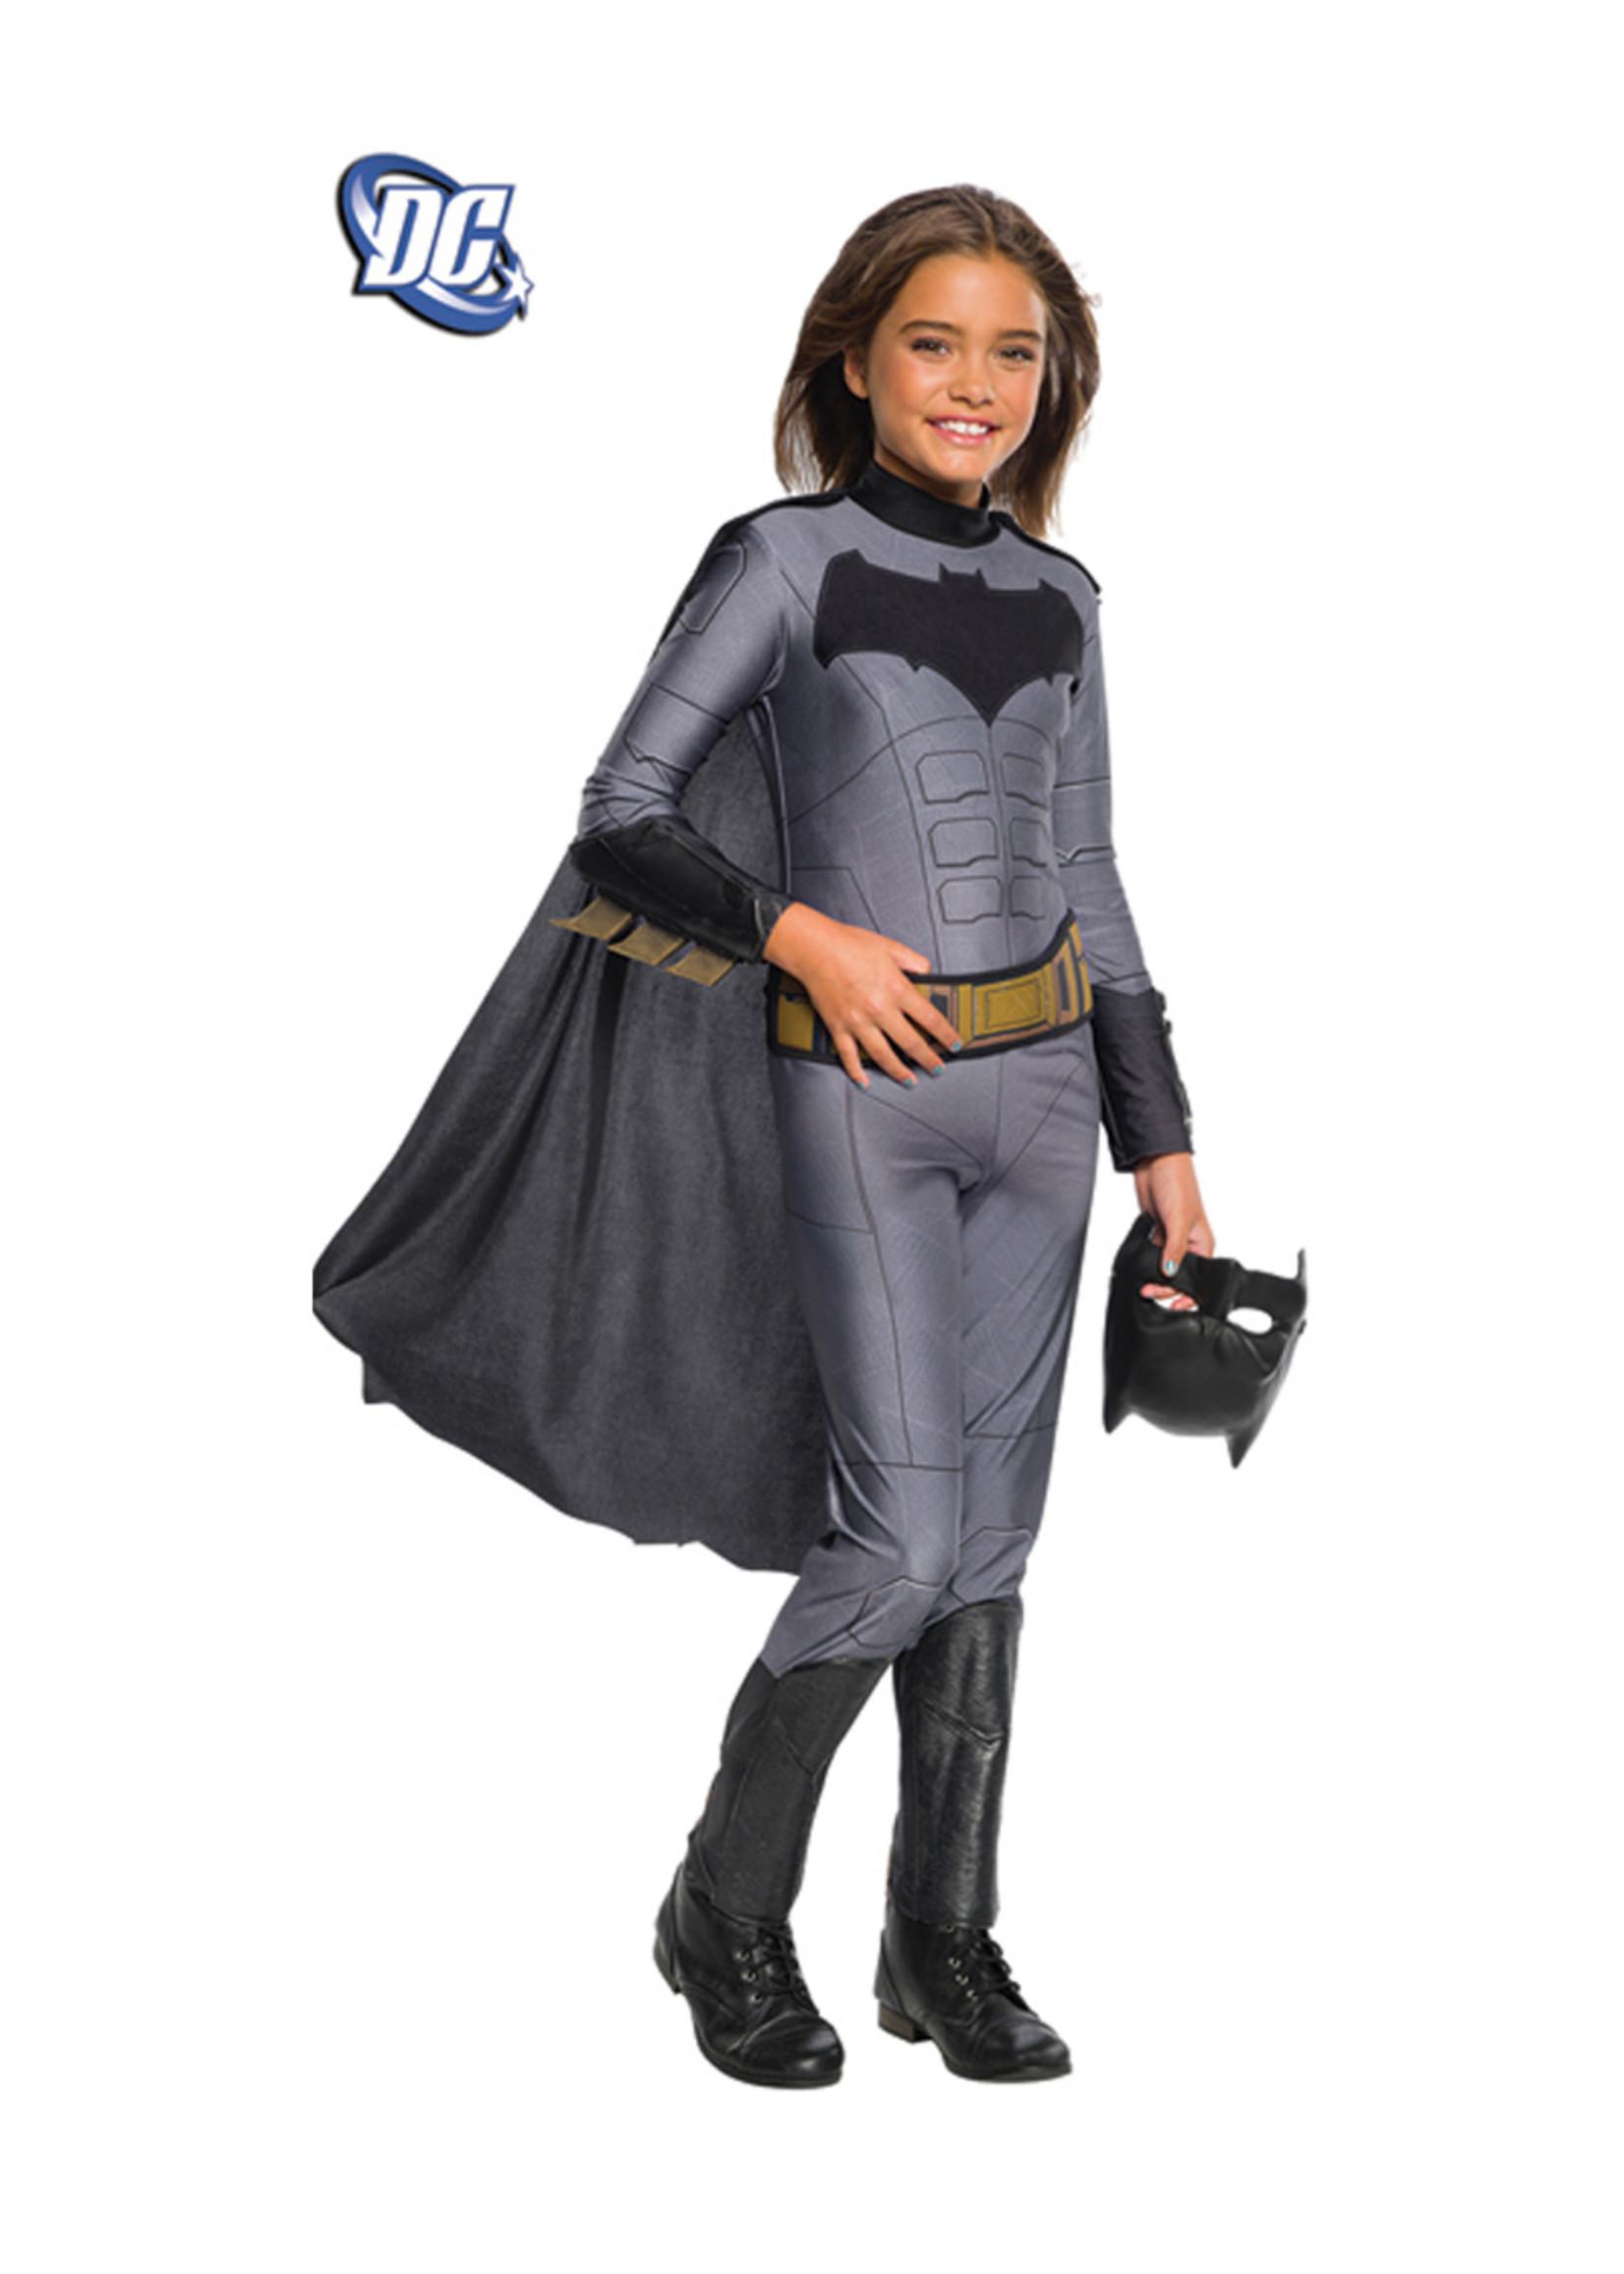 Batman Jumpsuit Costume - Girls